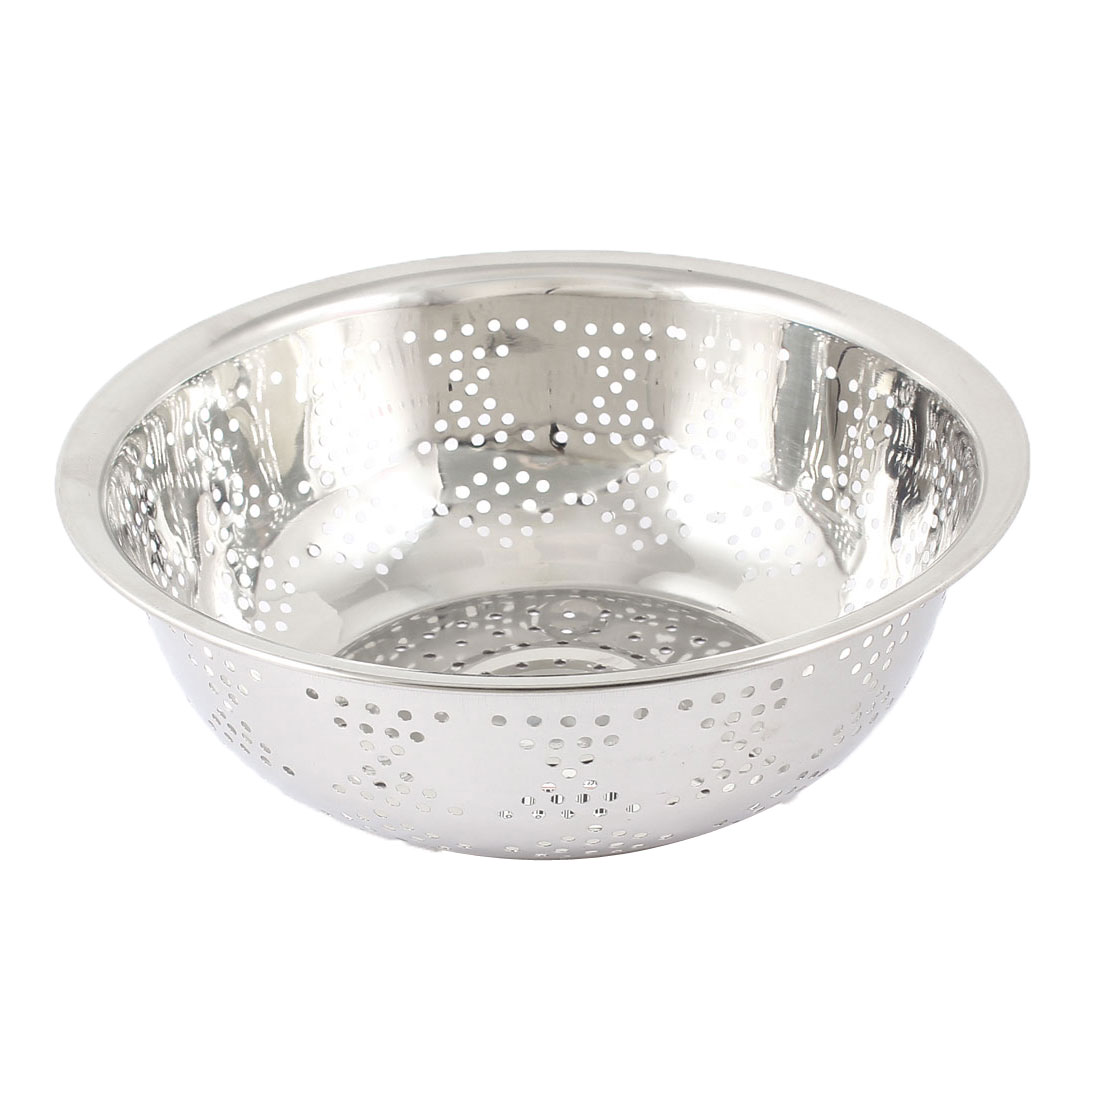 Mini Hole Side Bottom Drainers Design Rice Washing Bowl Wash Basin